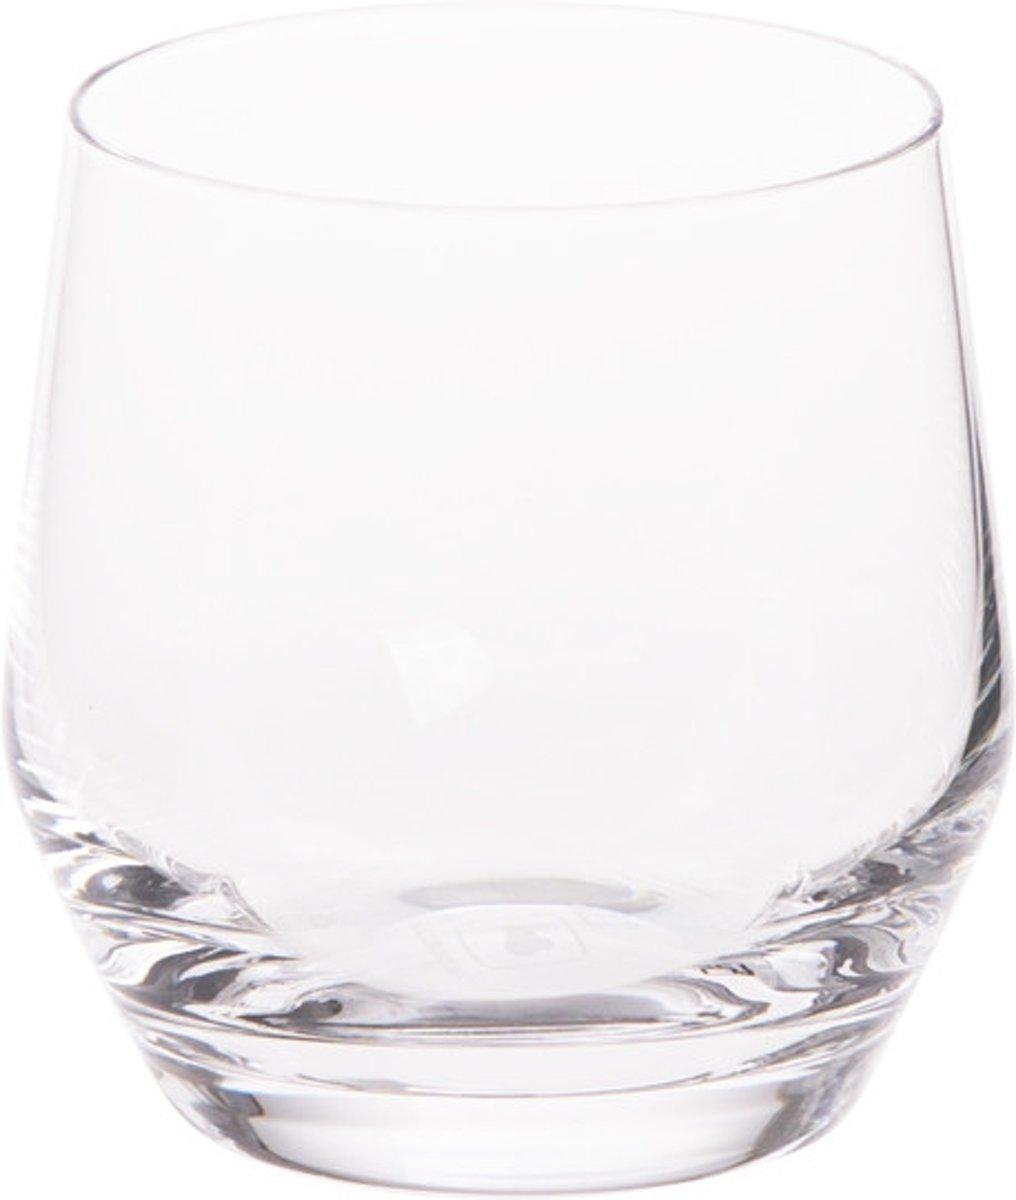 LEONARDO Puccini Whiskeytumbler 6stuk(s) kopen